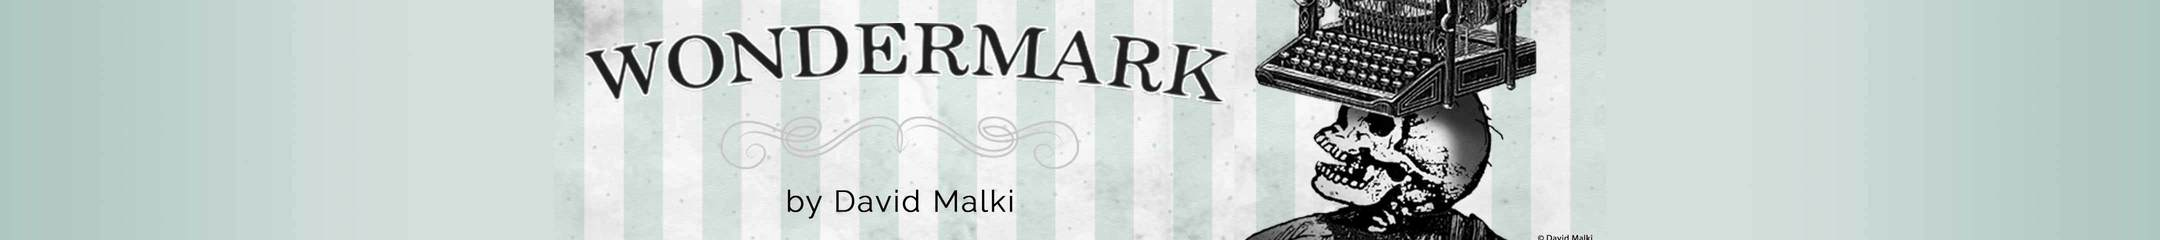 Wondermark